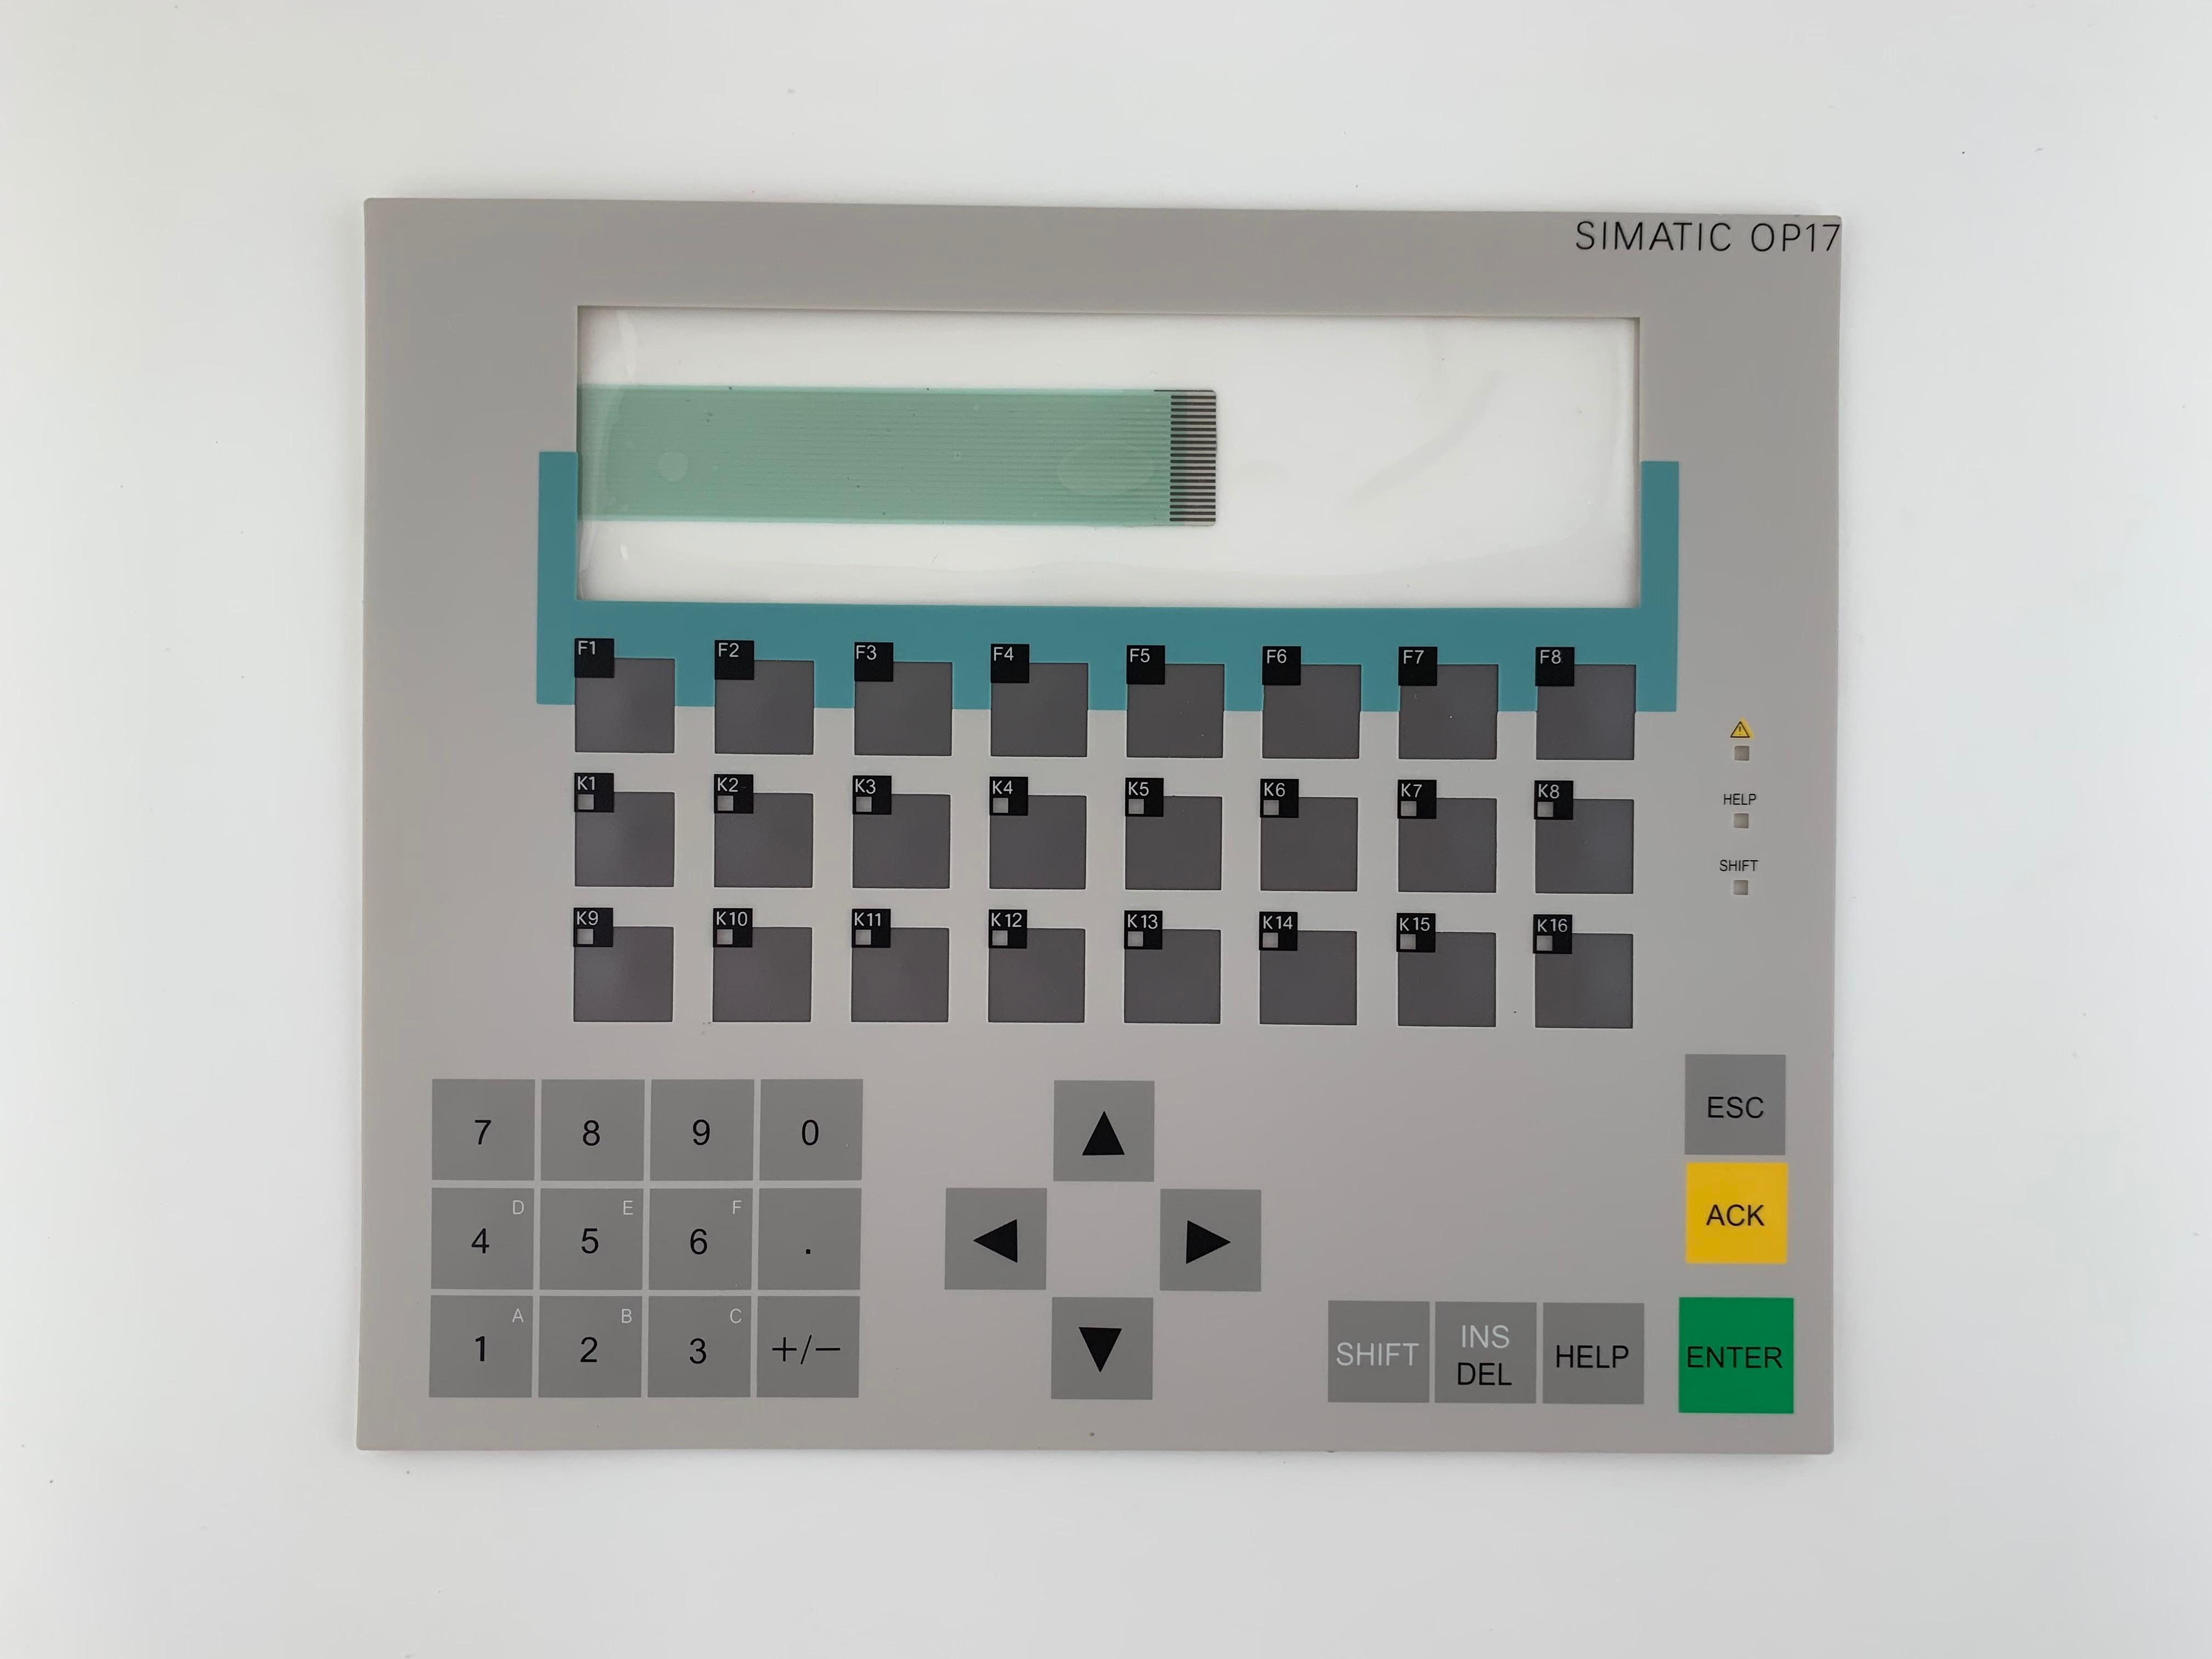 6AV3617-1JC20-0AX1 OP17 ، SIMATIC طبقة رقيقة واقية ، لوحة مفاتيح غشائية ل SIMATIC لوحة إصلاح ، في الأسهم